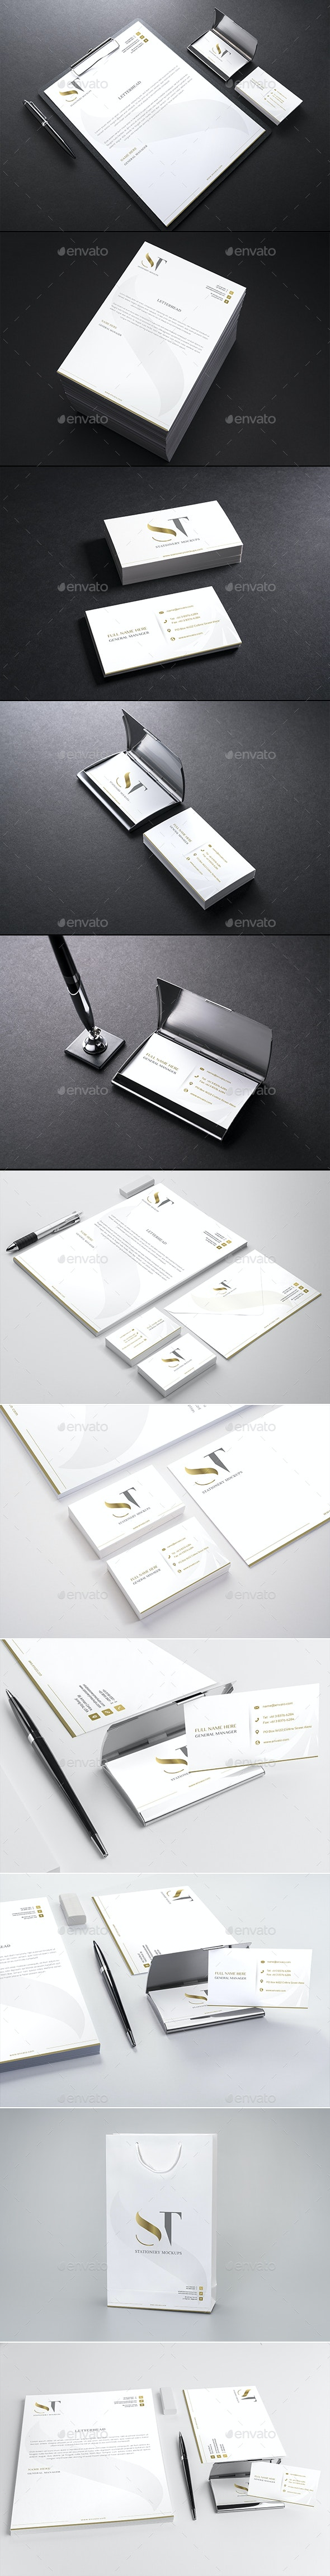 Realistic Branding - Stationery - Corporate ID Mockups Set2 - Stationery Print